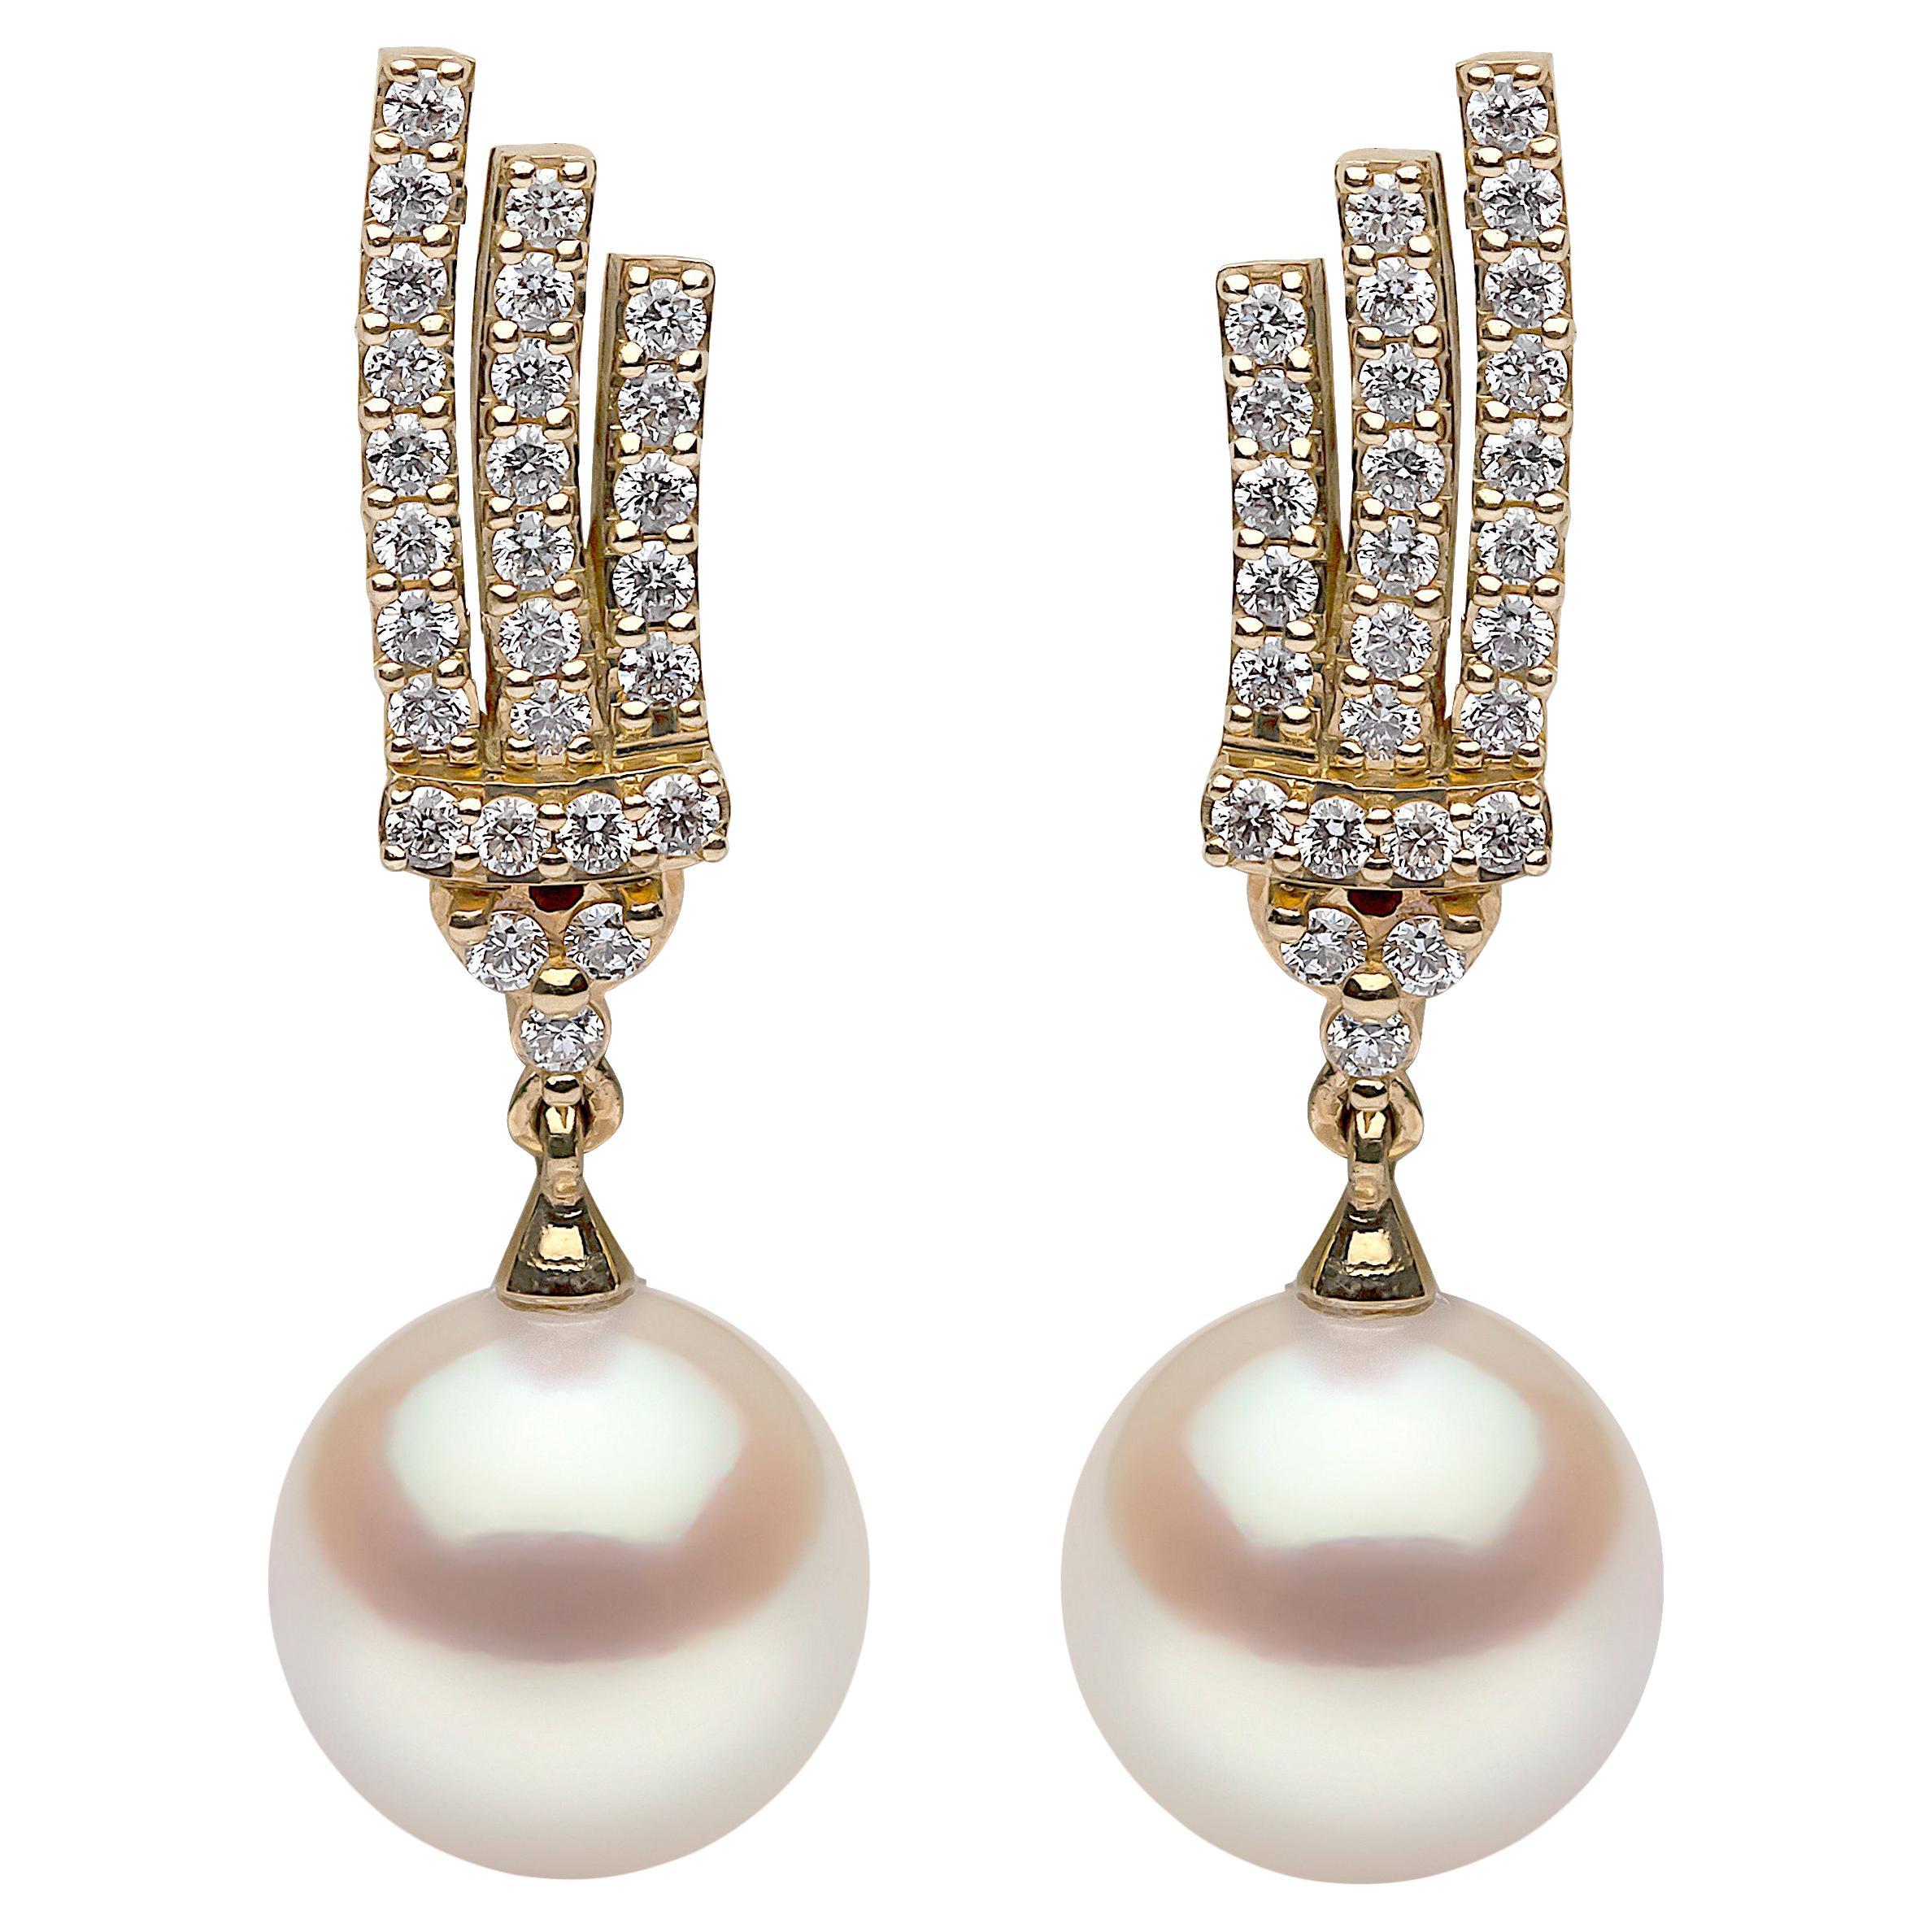 Yoko London Freshwater Pearl and Diamond Earrings in 18 Karat Yellow Gold